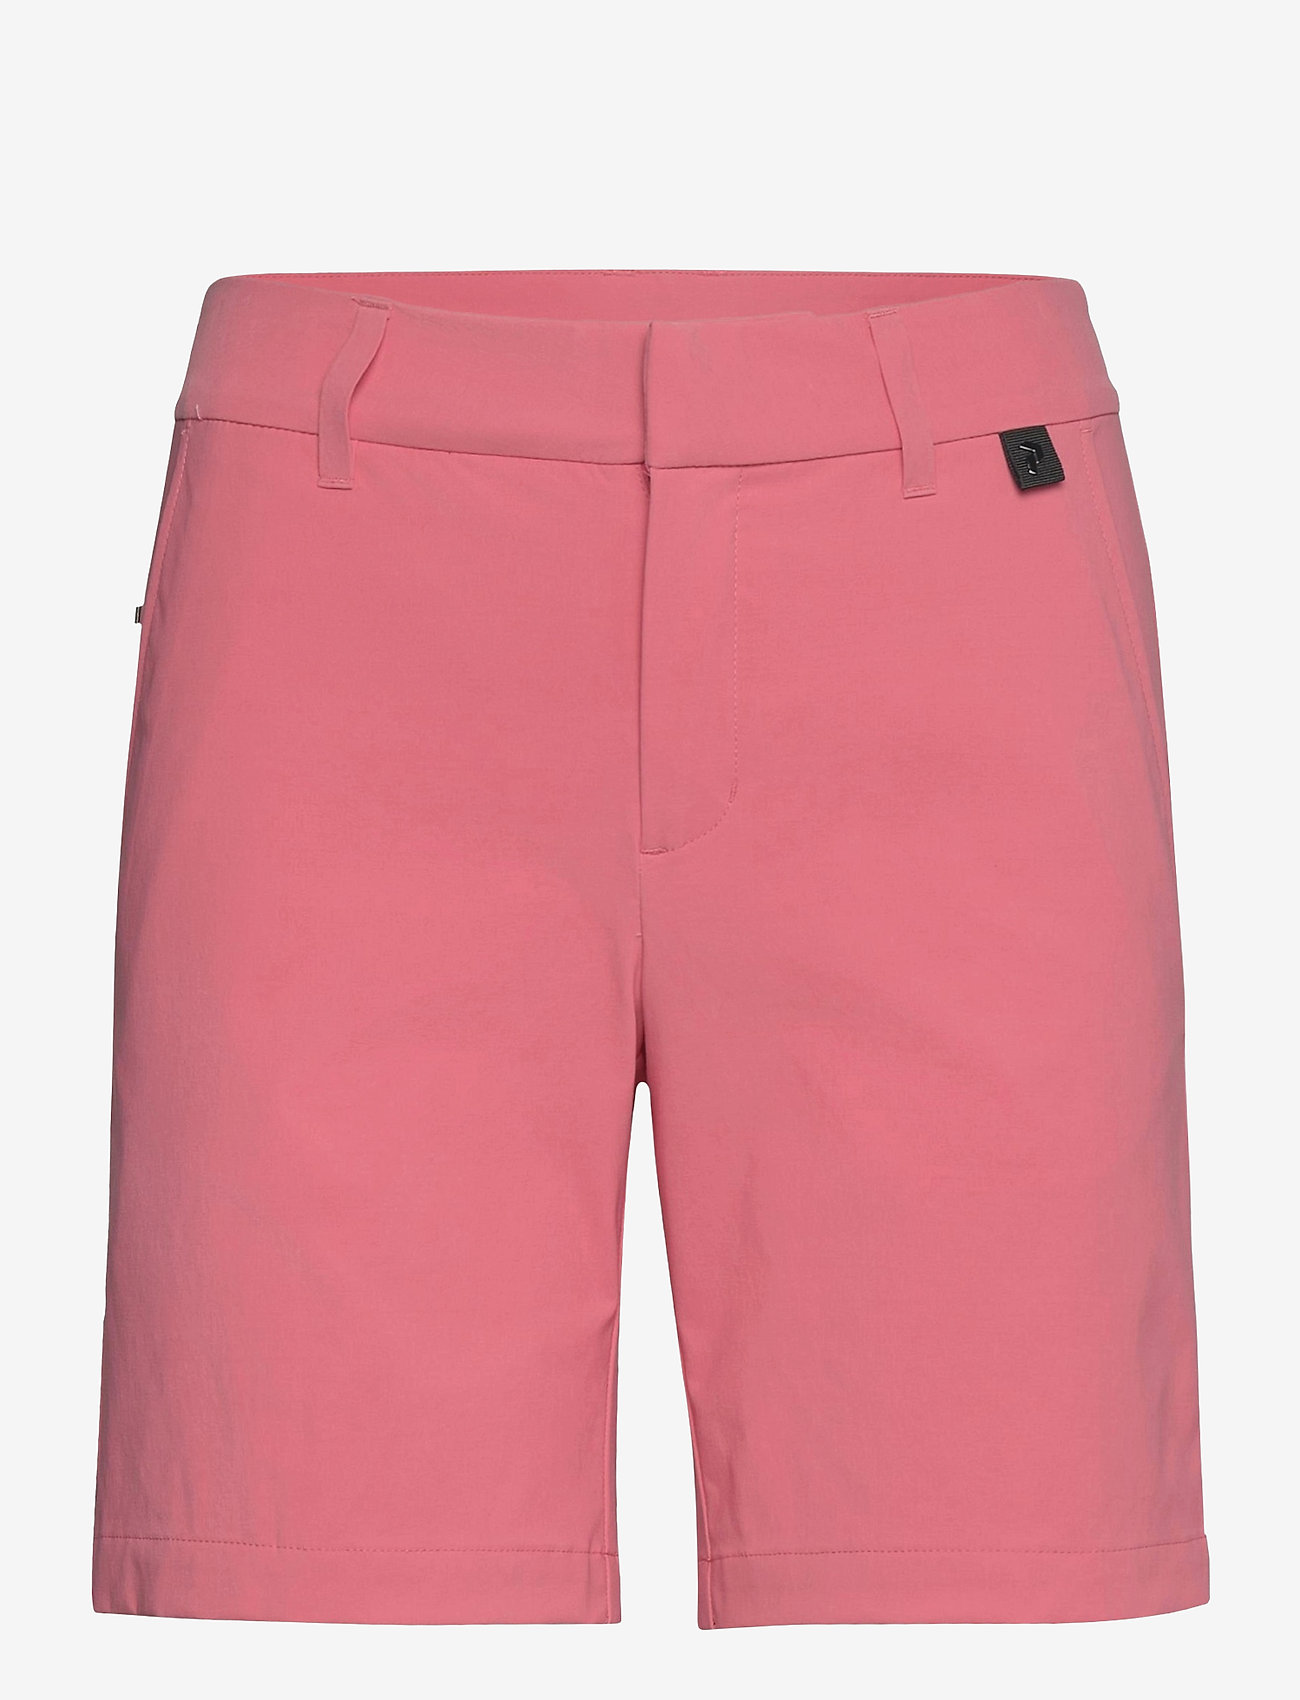 Peak Performance - W Illusion Shorts - wandel korte broek - alpine flower - 0